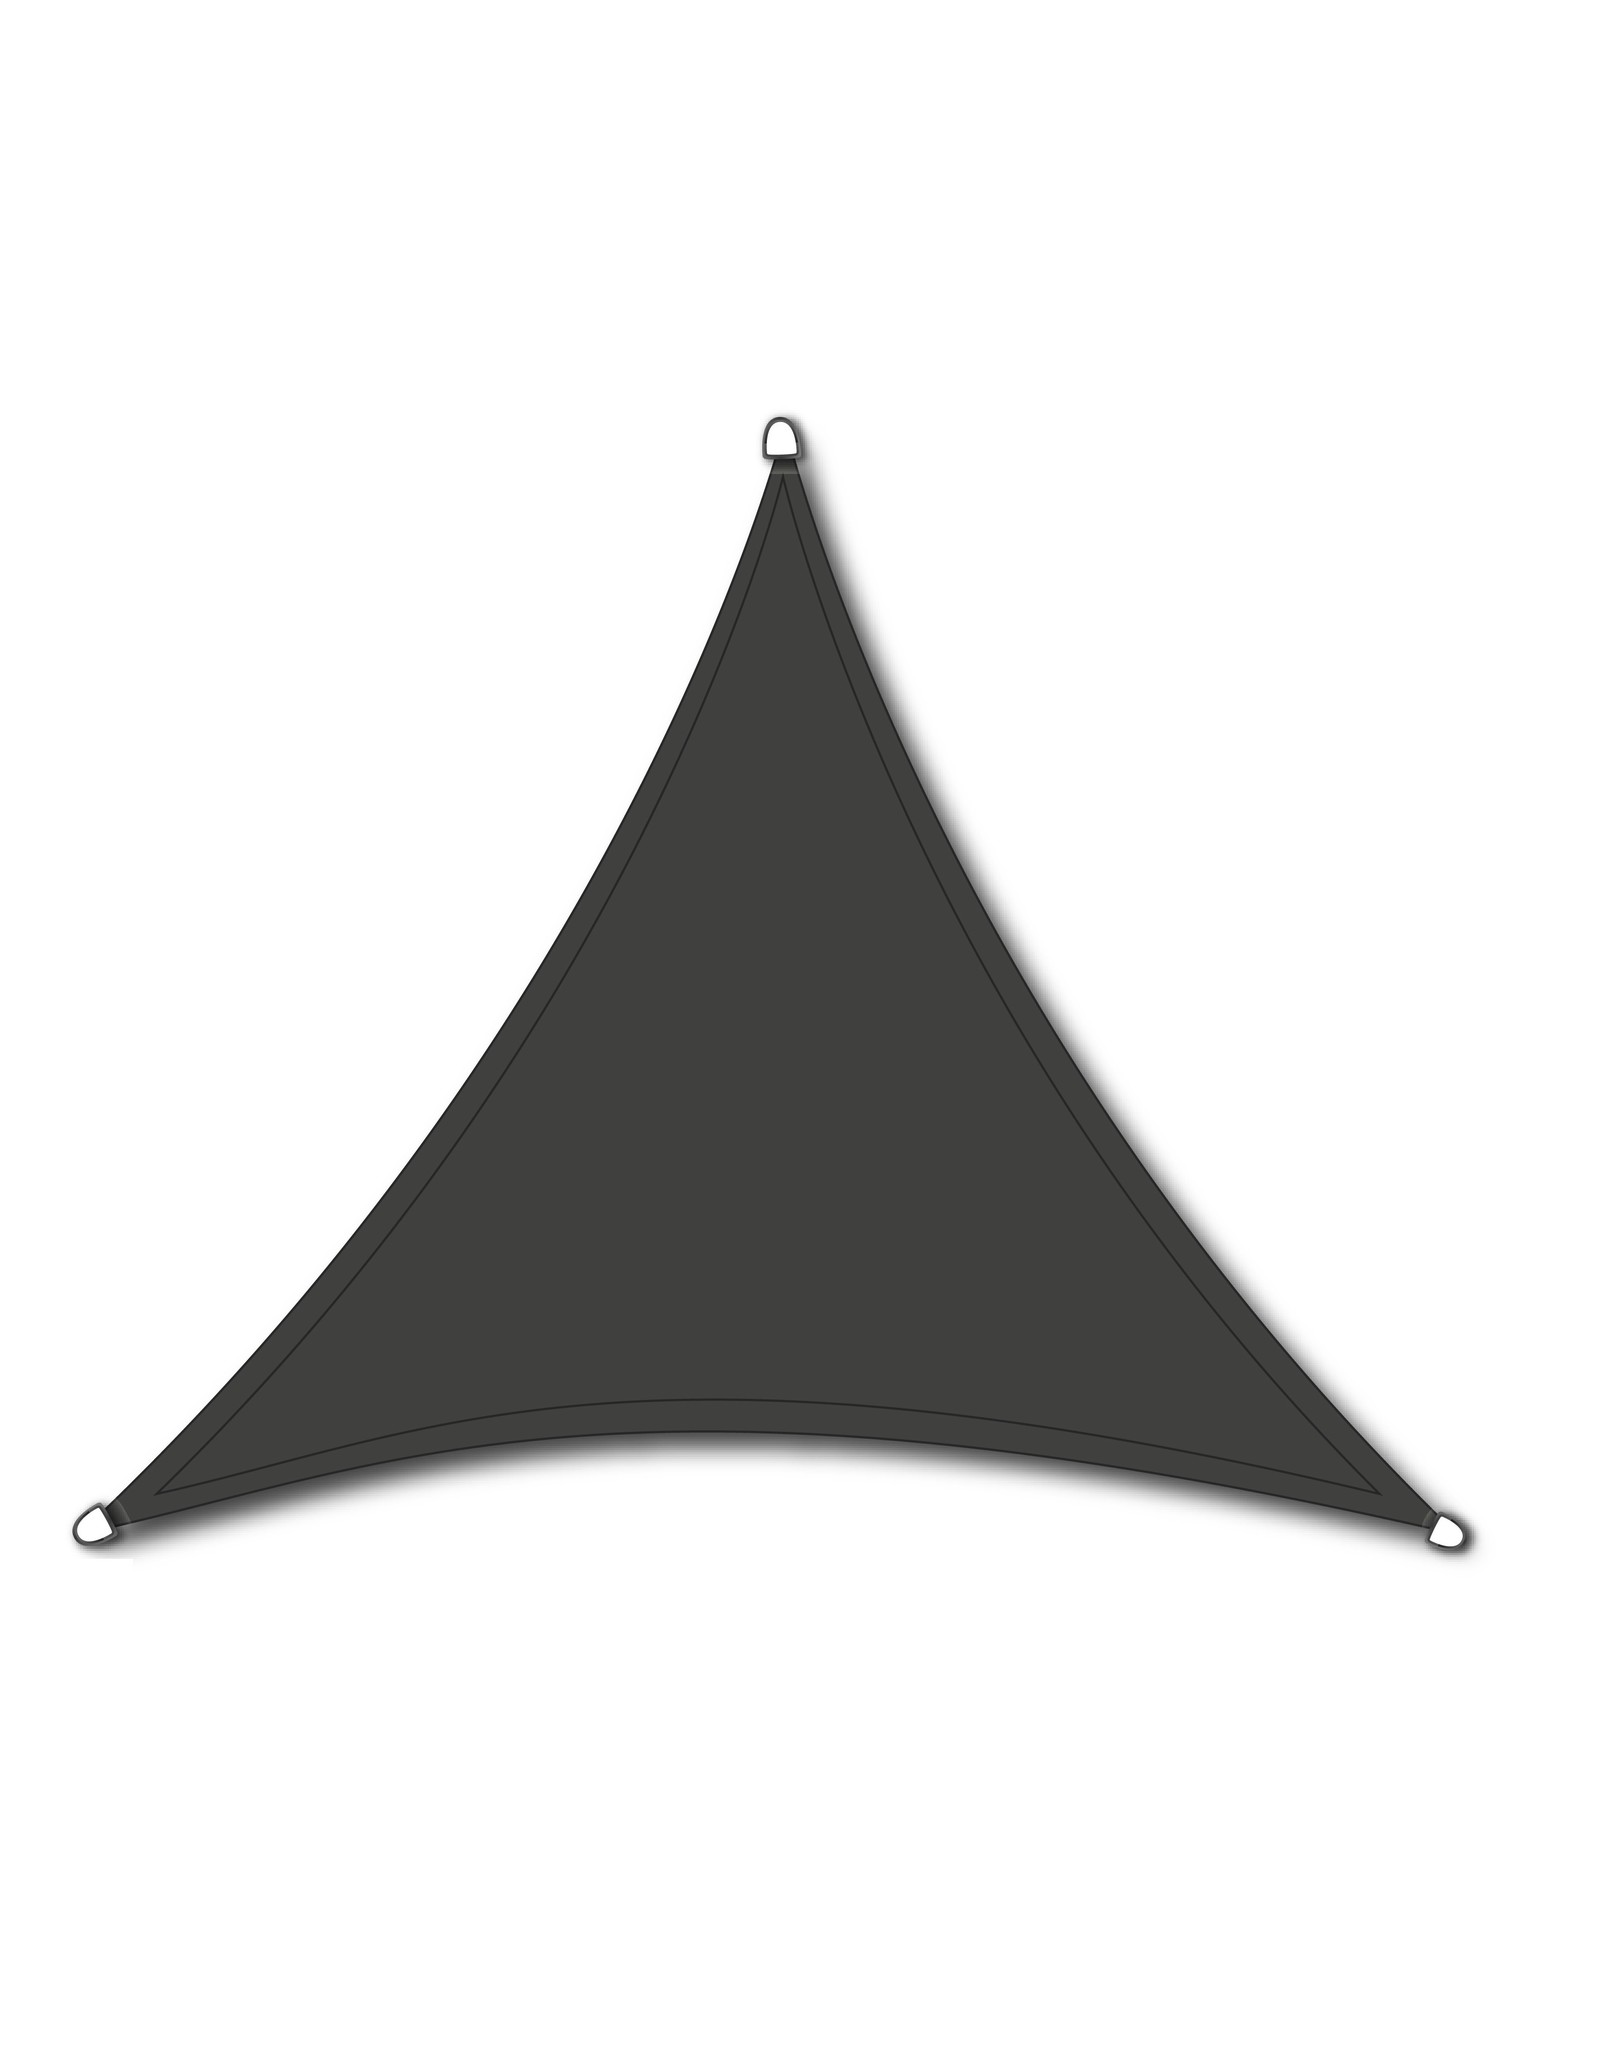 Parya Garden Shade cloth - 3.6 meters - Triangle